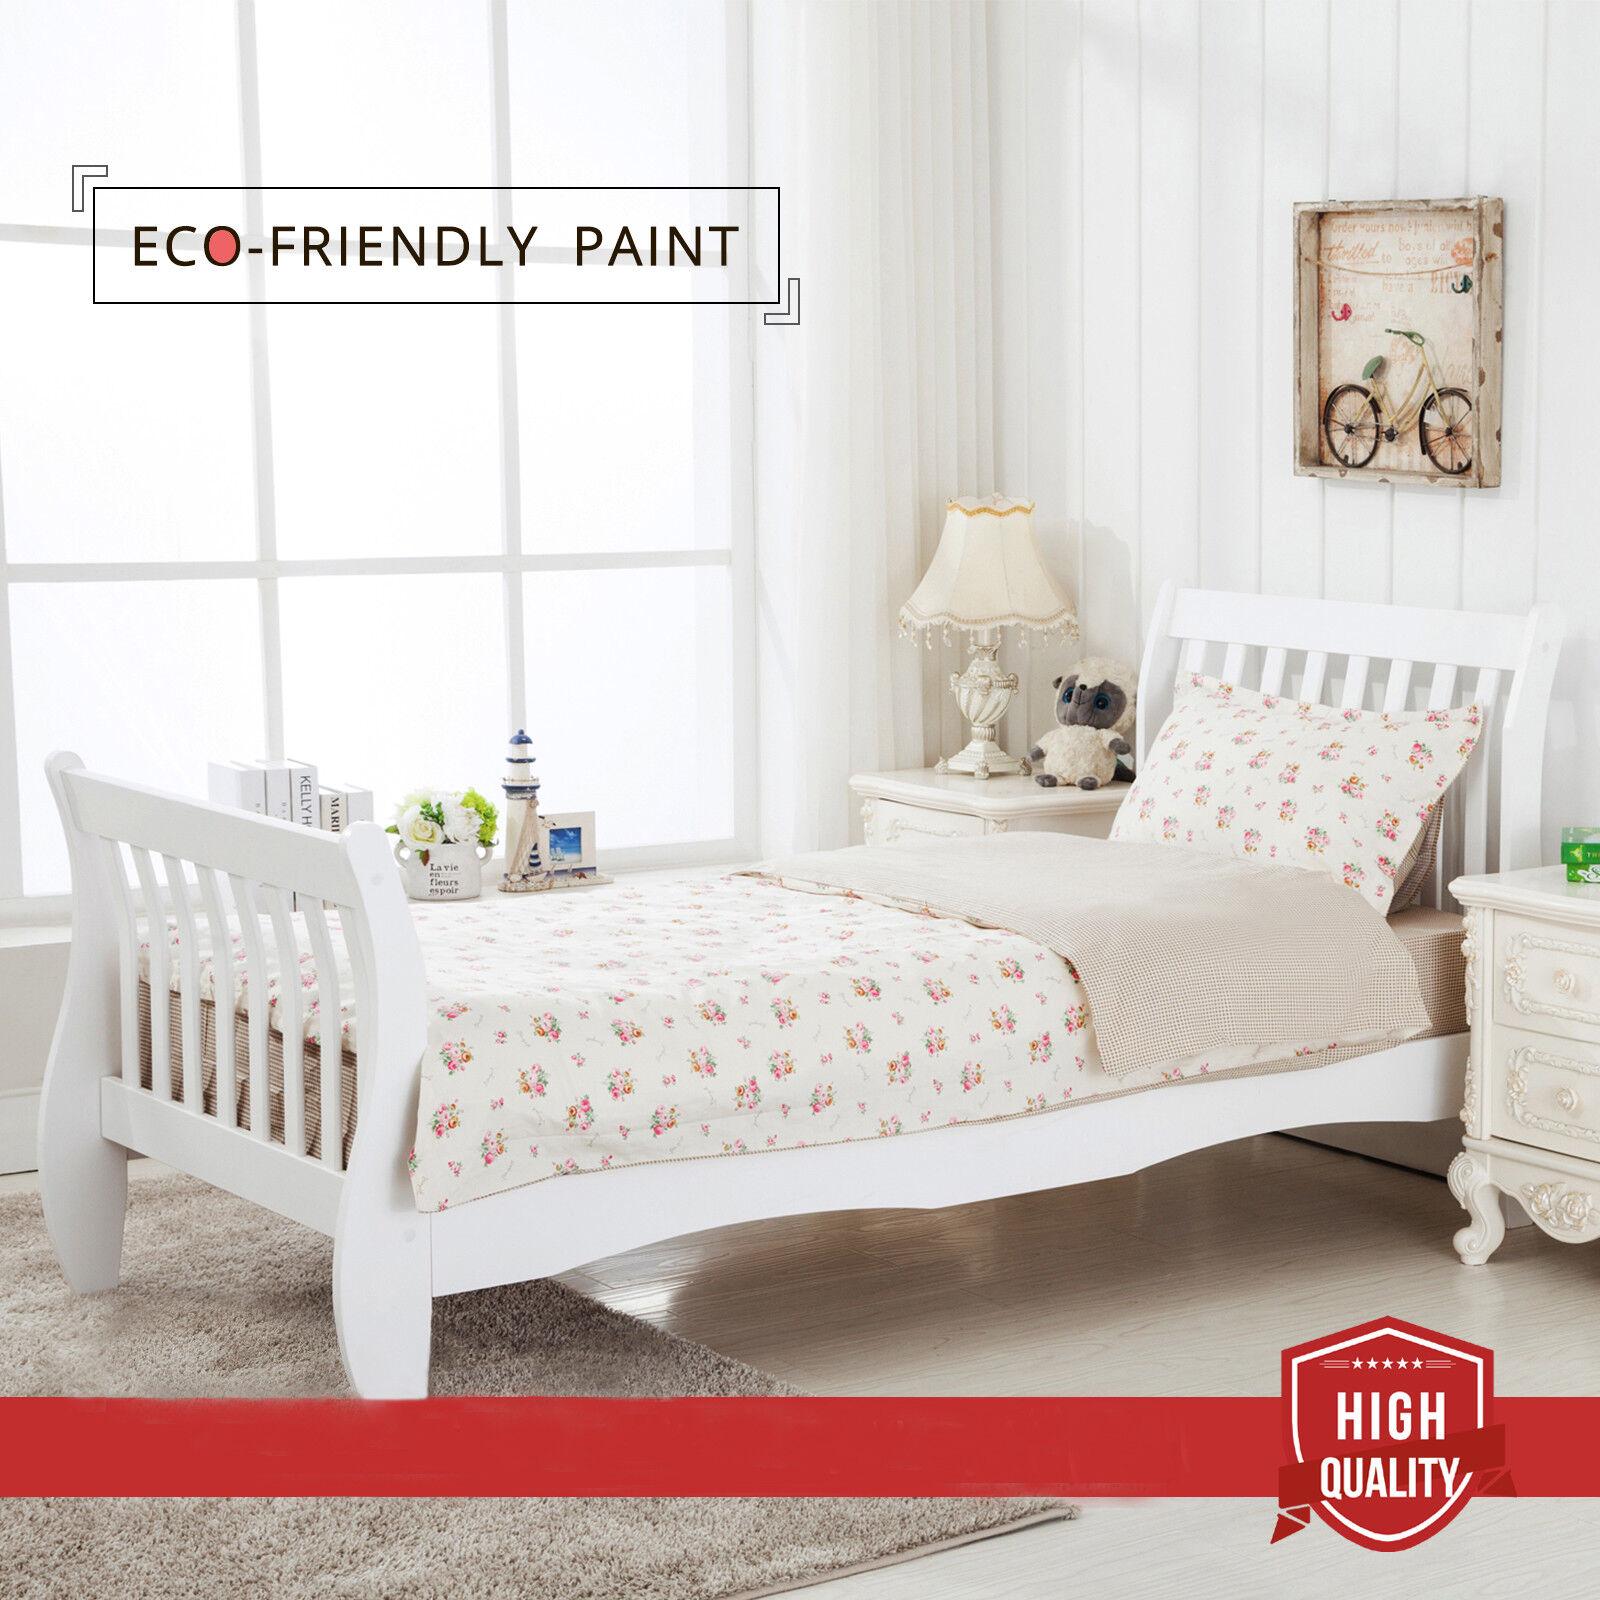 3ft single bed sleigh wood frame white high headboard slat bedroom furniture